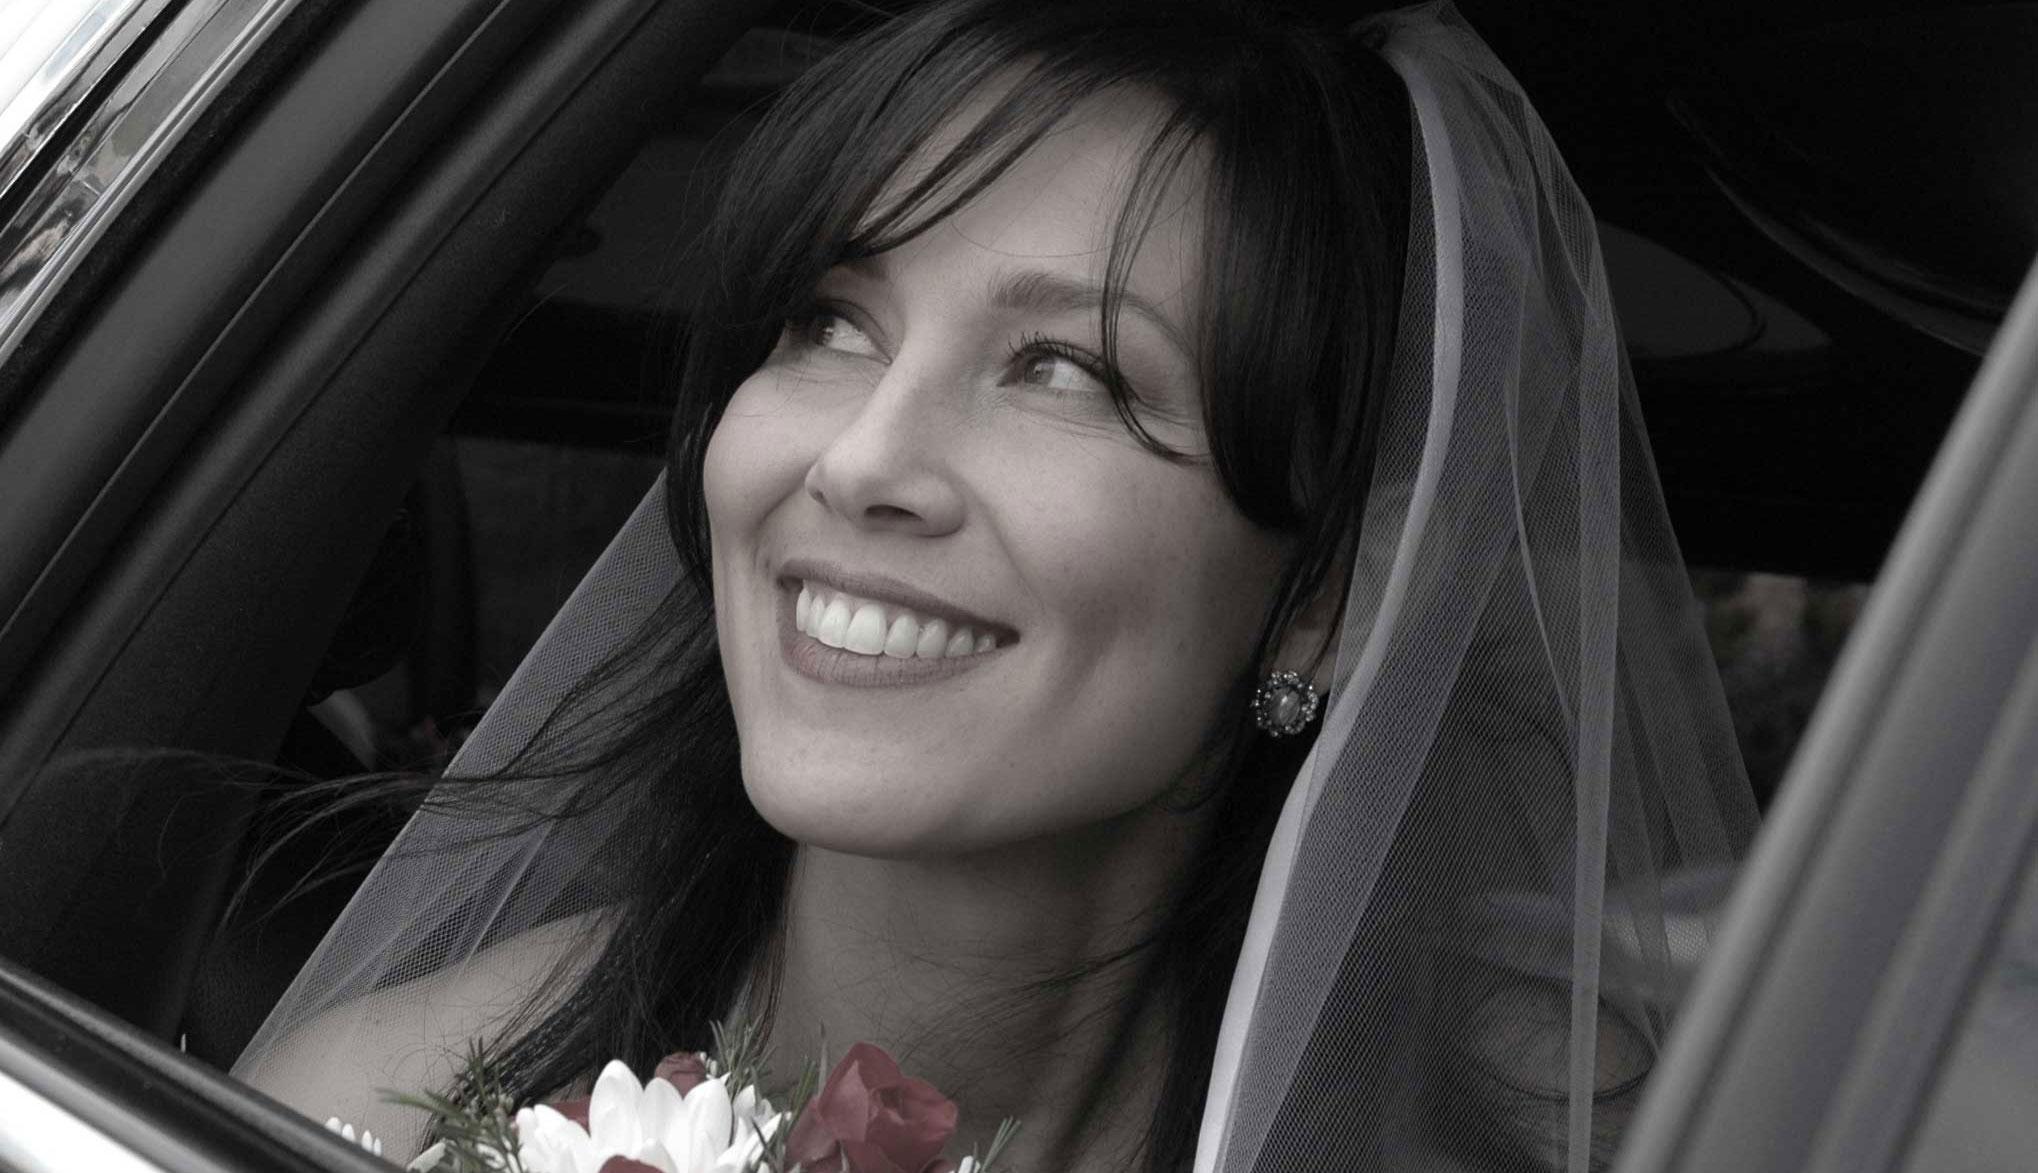 weddings in nashville